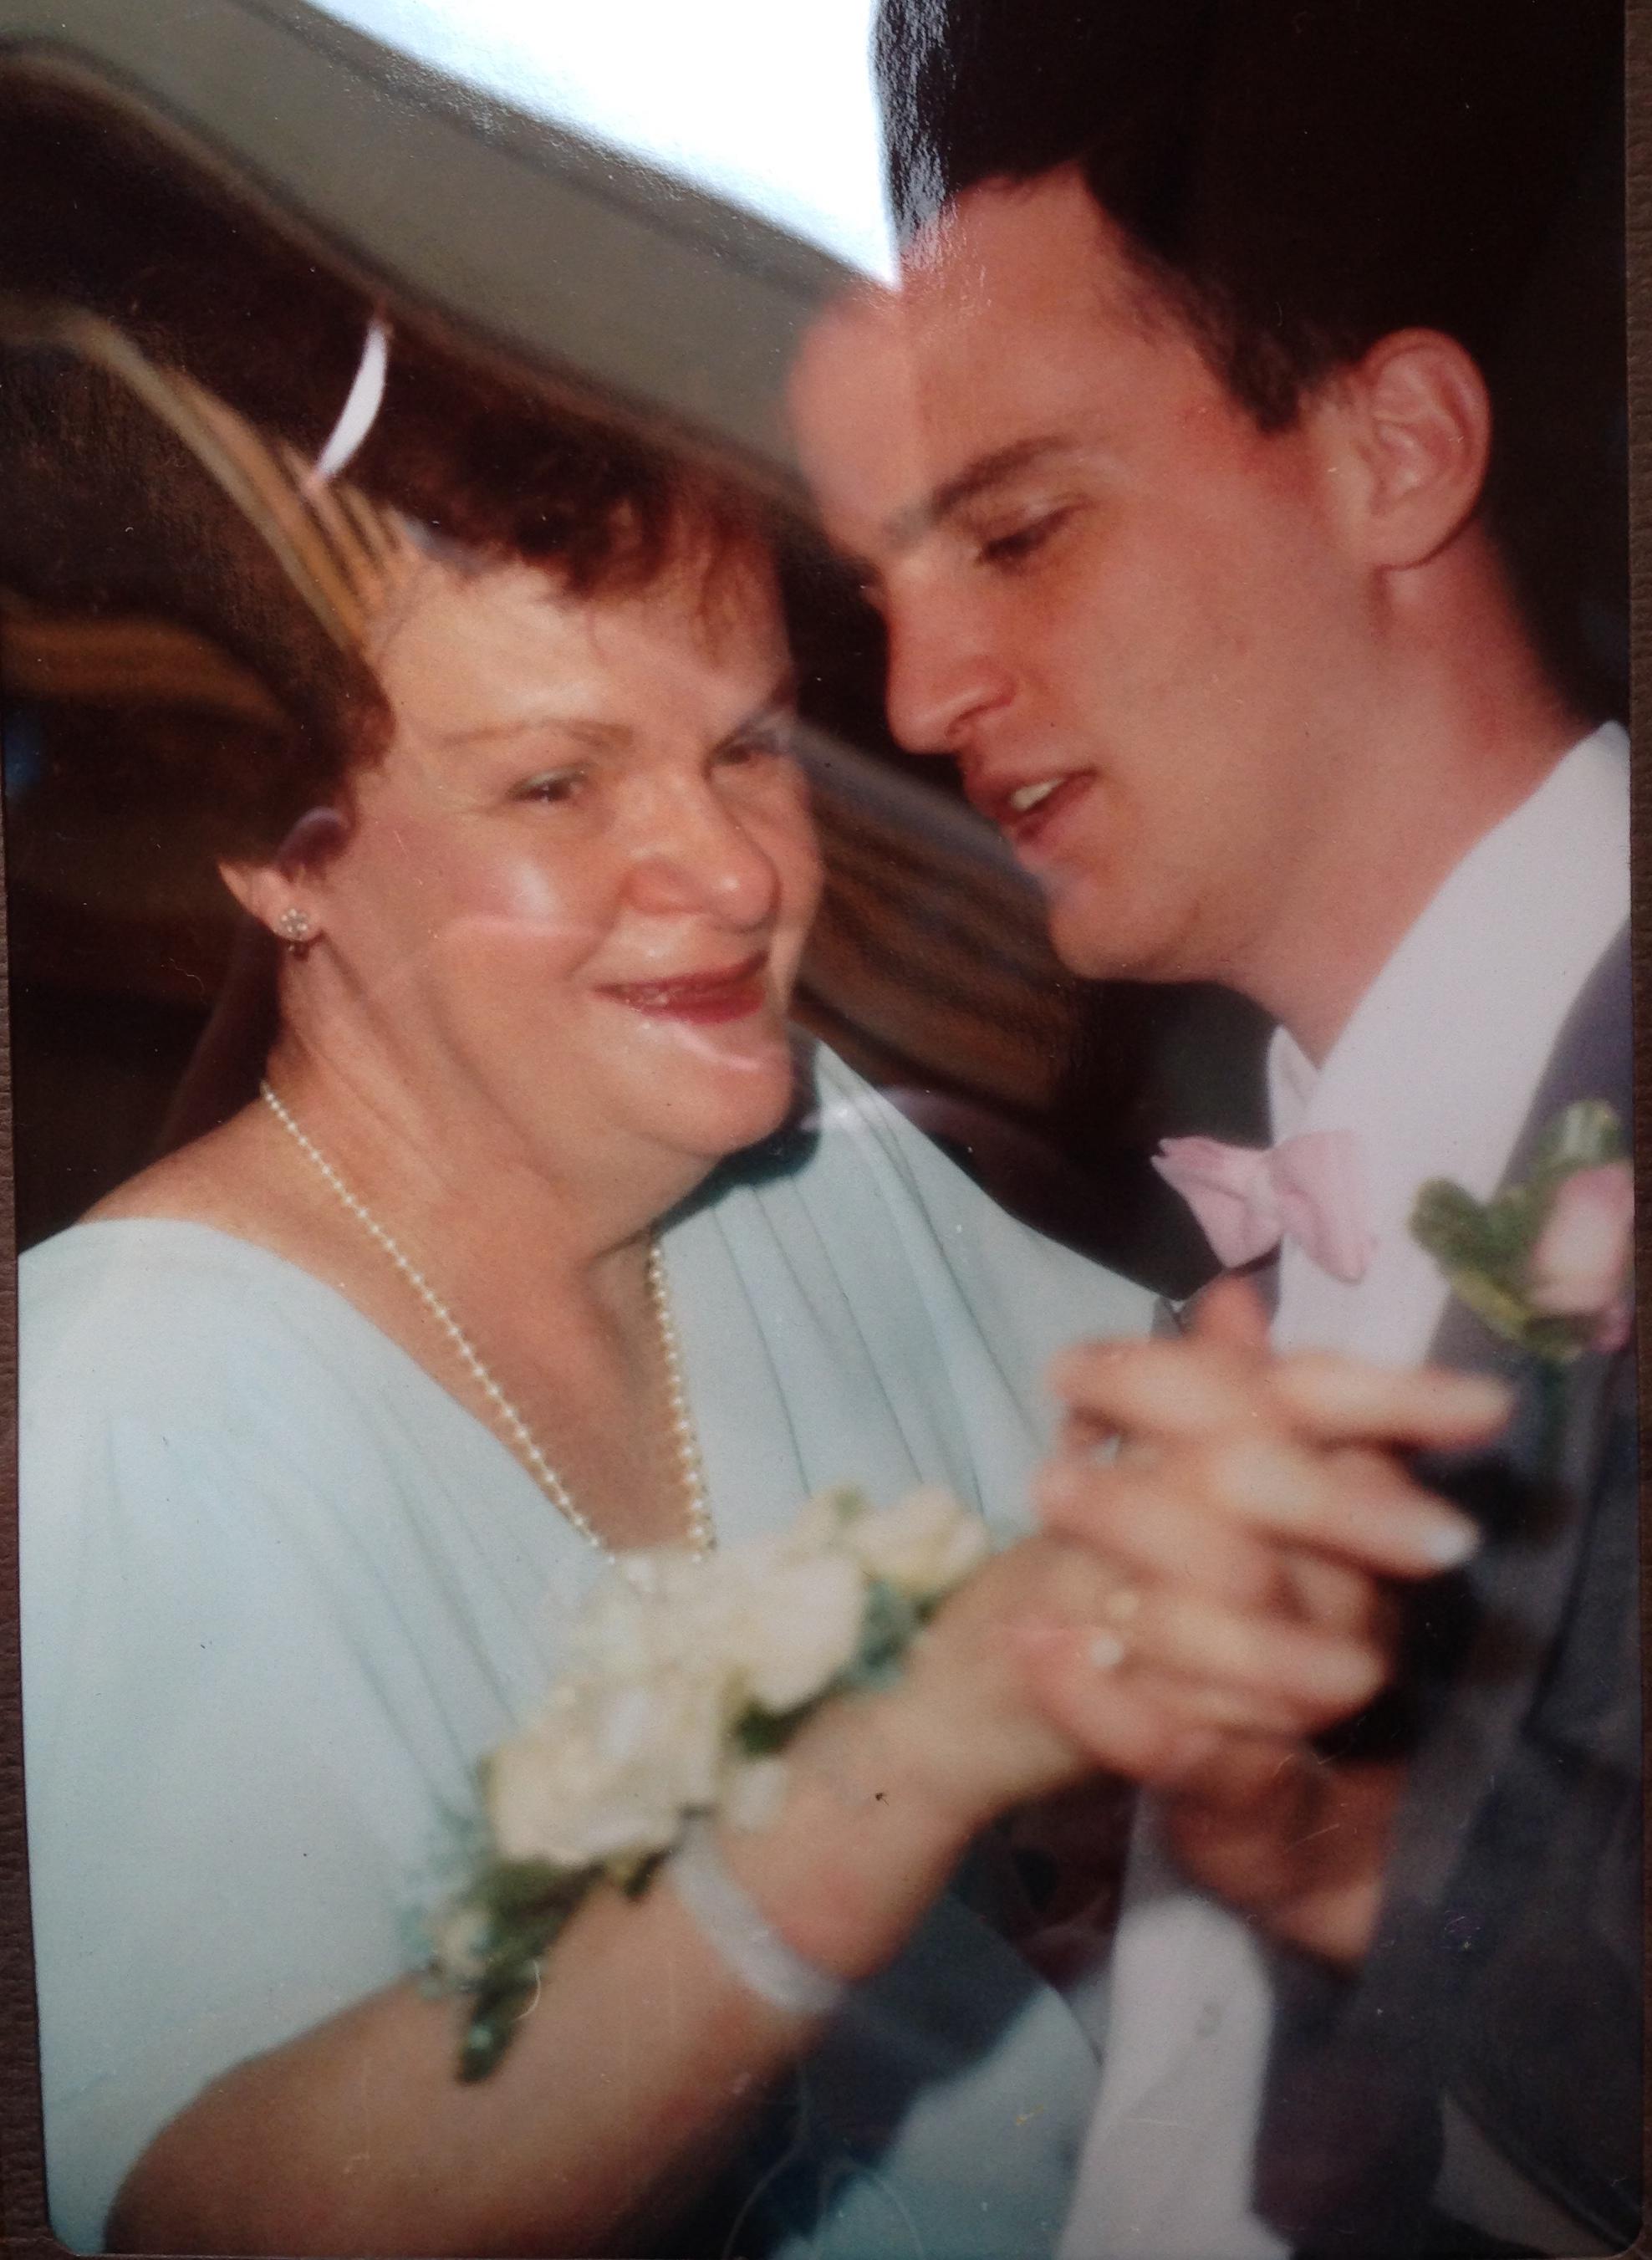 Dancing at my sister's wedding,30 years ago.